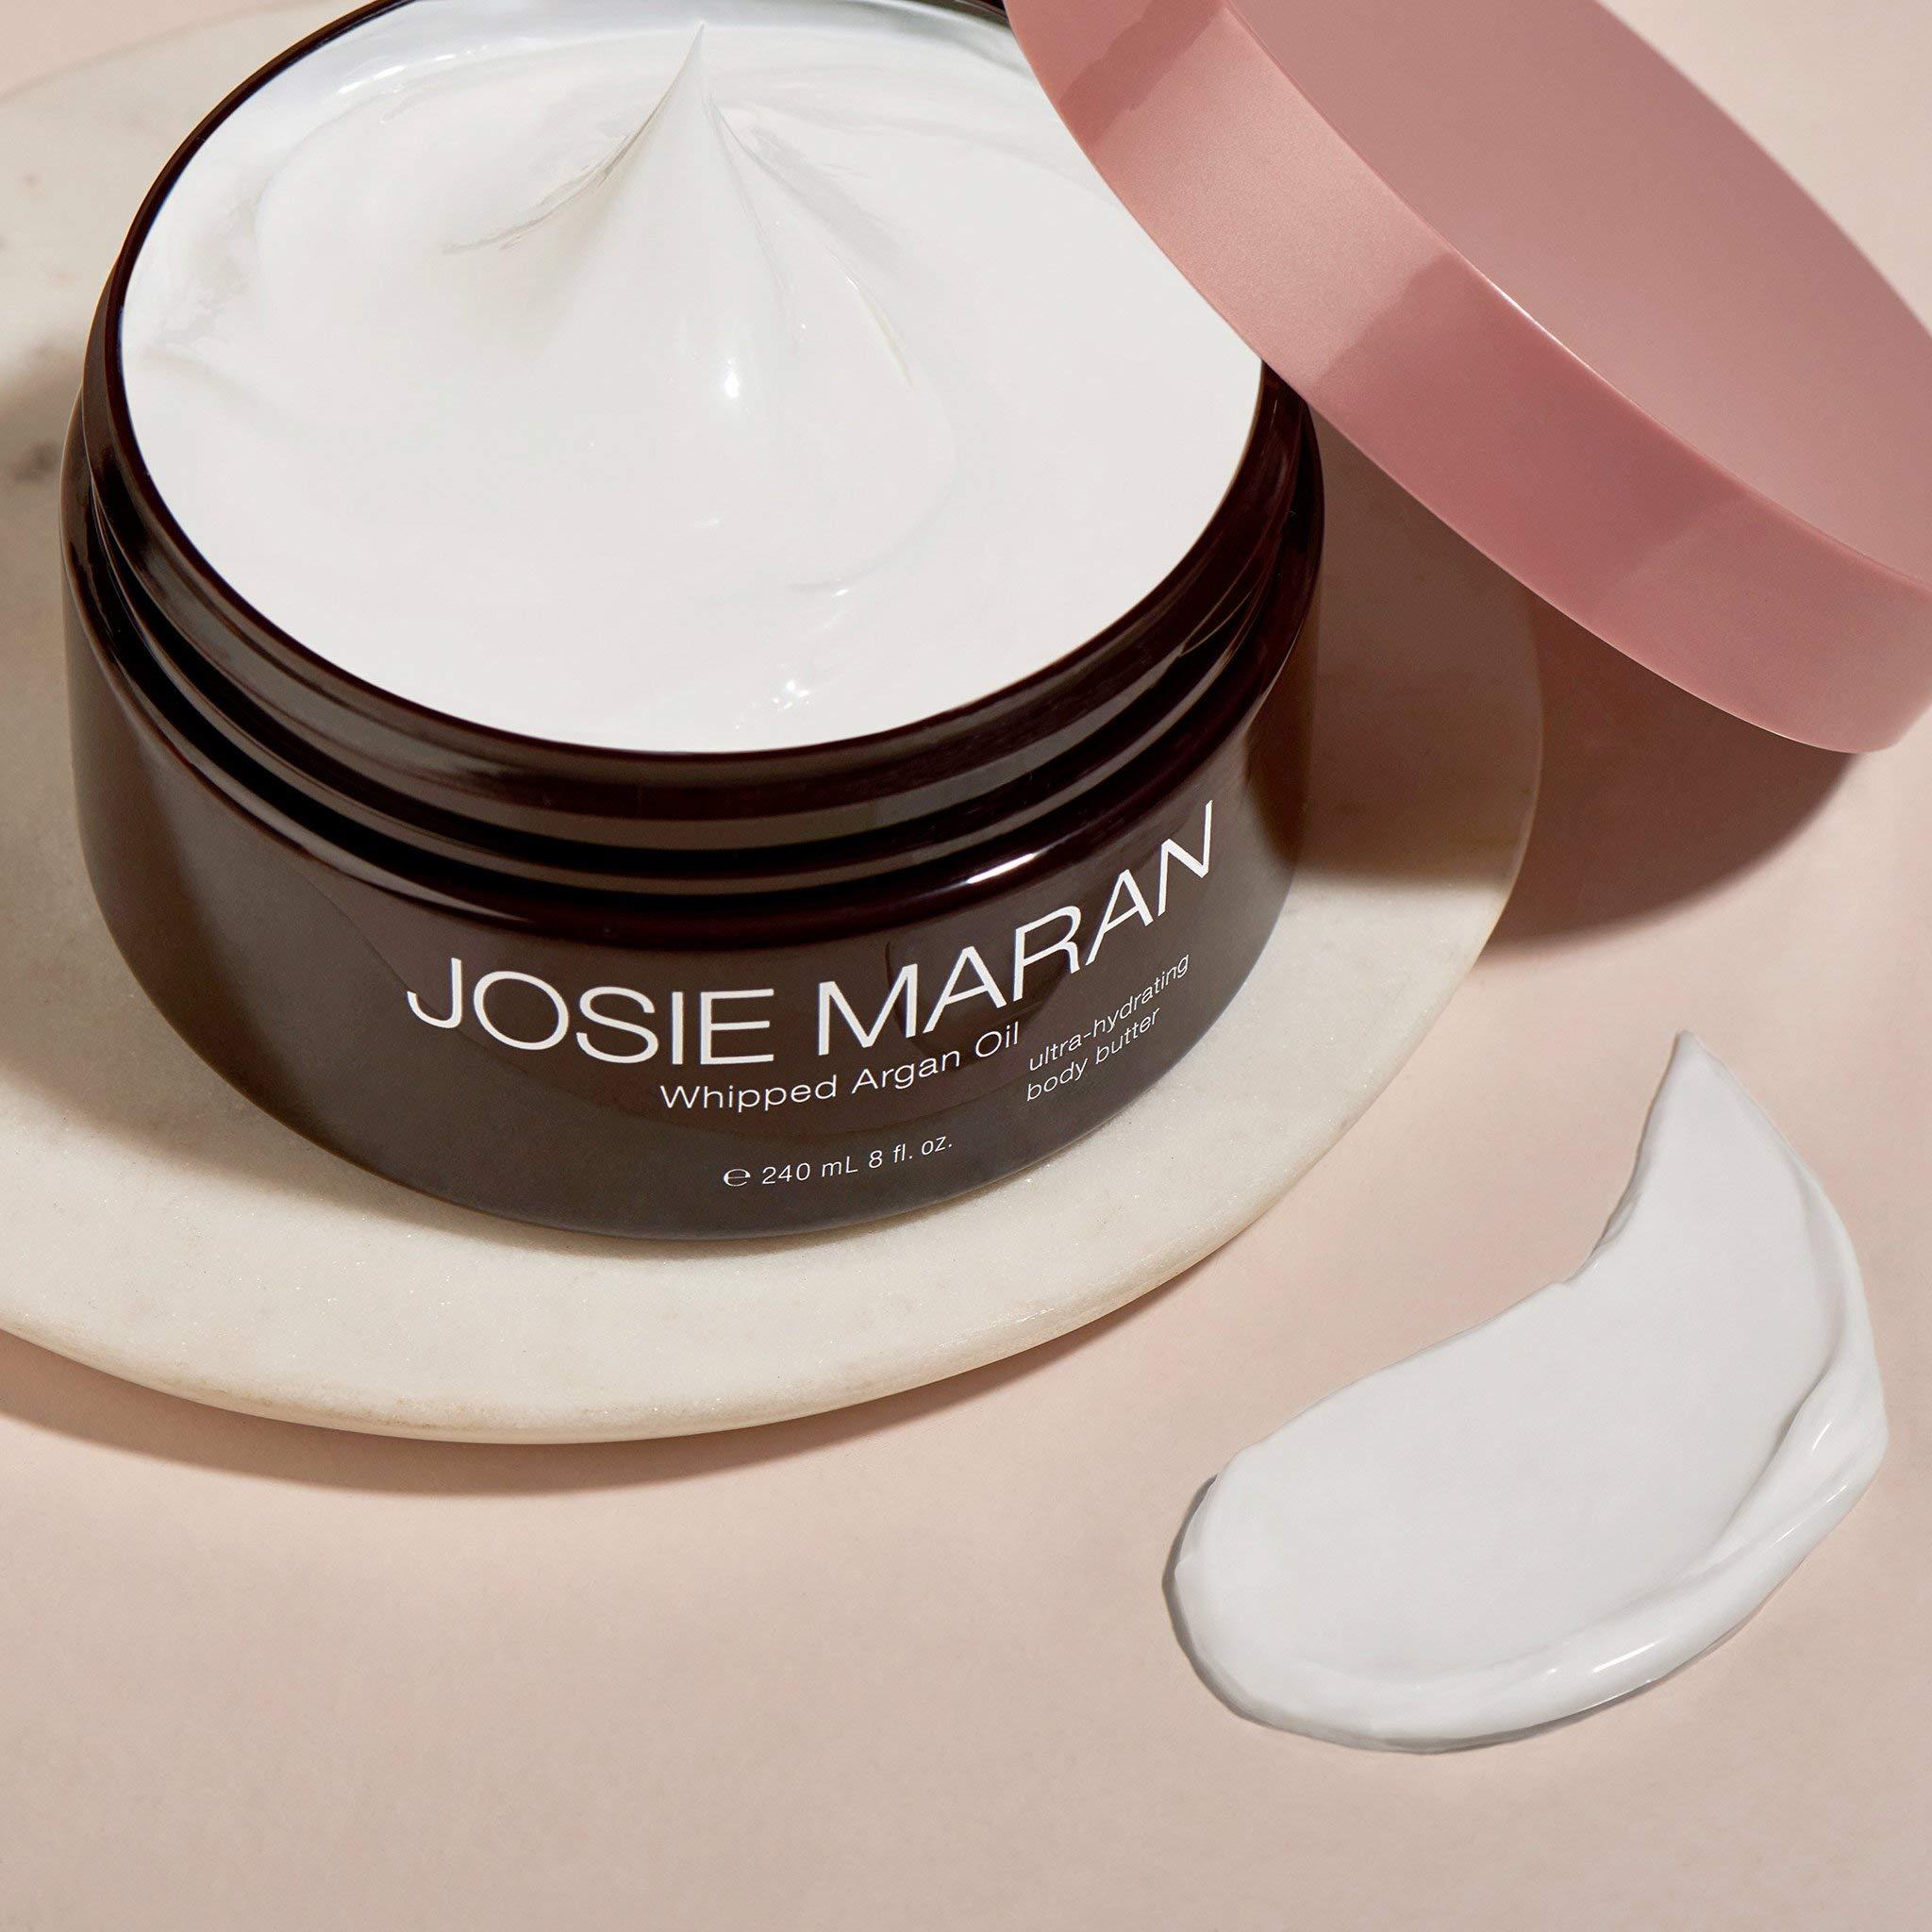 Josie Maran Whipped Argan Oil Body Butter - Immediate, Lightweight, and Long-Lasting Nourishment to Soften and Hydrate Skin (240ml/8.0oz, Vanilla Bean) by Josie Maran (Image #4)